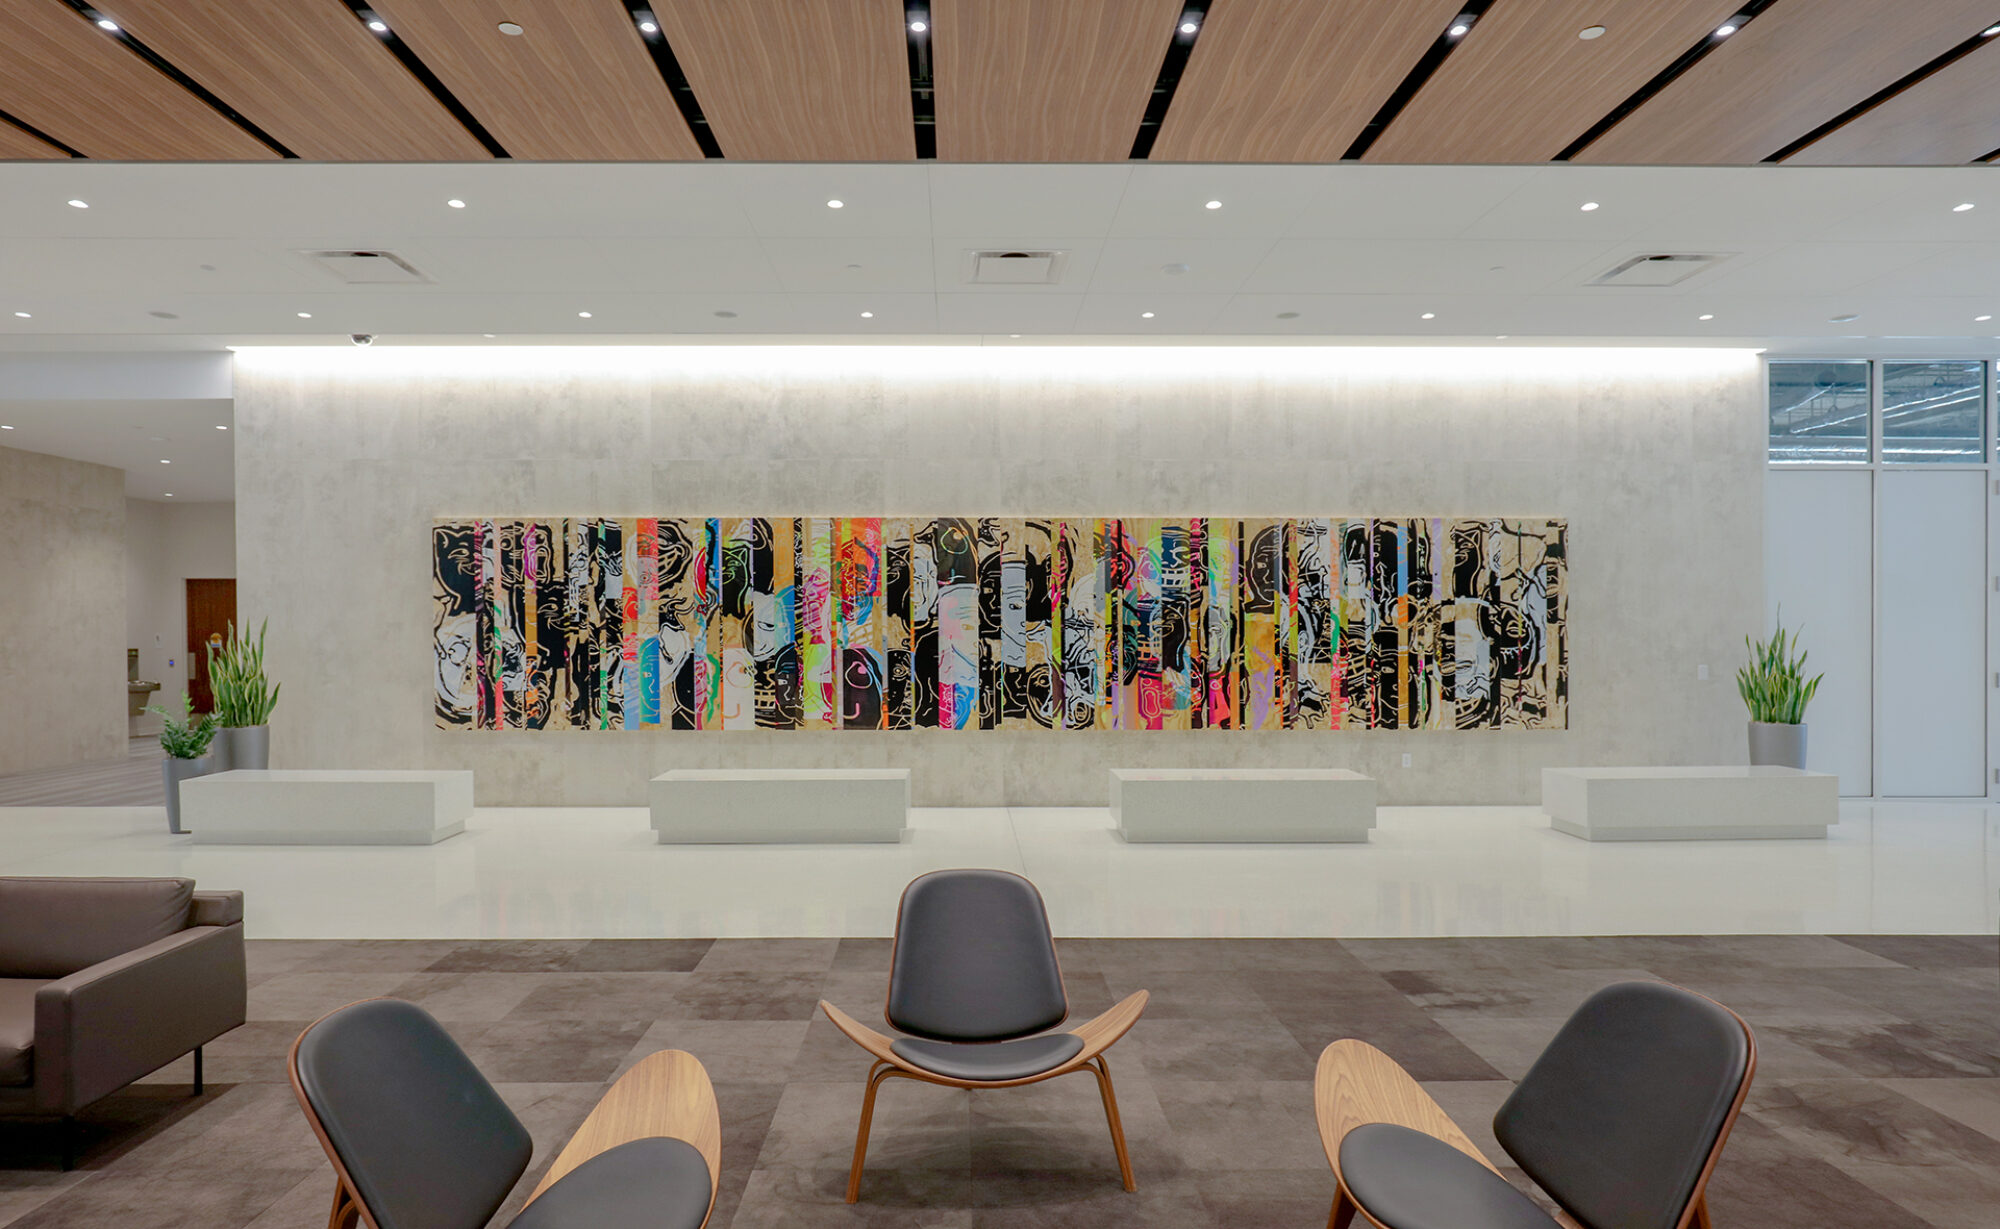 Moberg Art Services